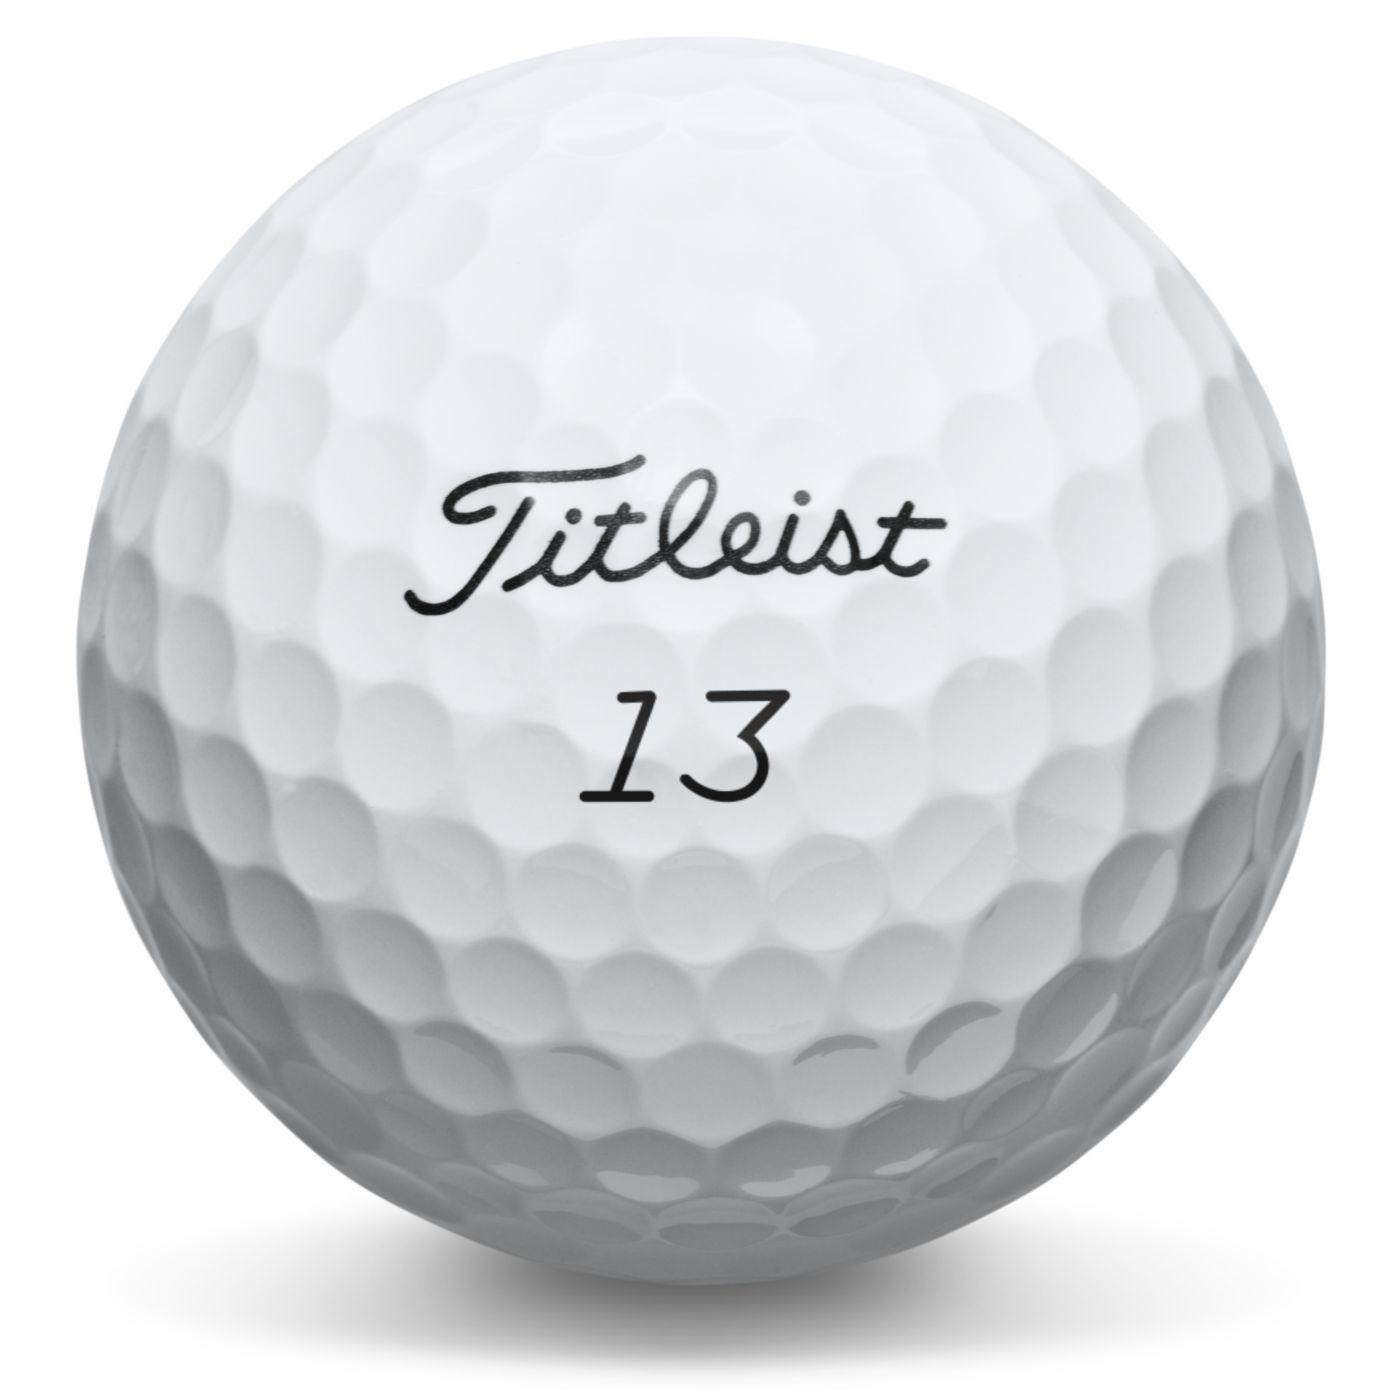 https://www.best4balls.com/pub/media/catalog/product/p/r/pro_v1_special_play_13_3.jpg